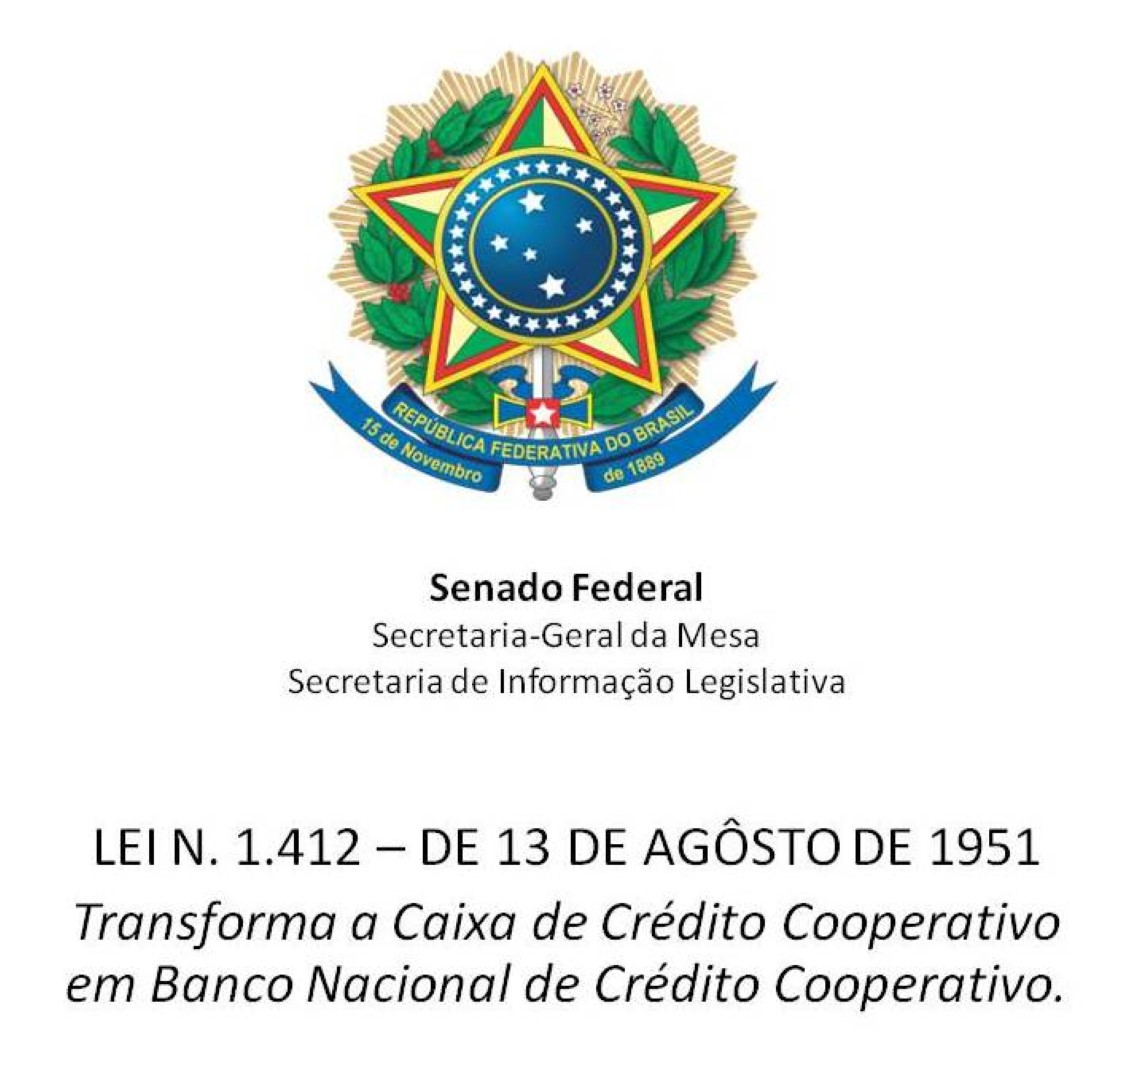 Banco Nacional de Crédito Cooperativo